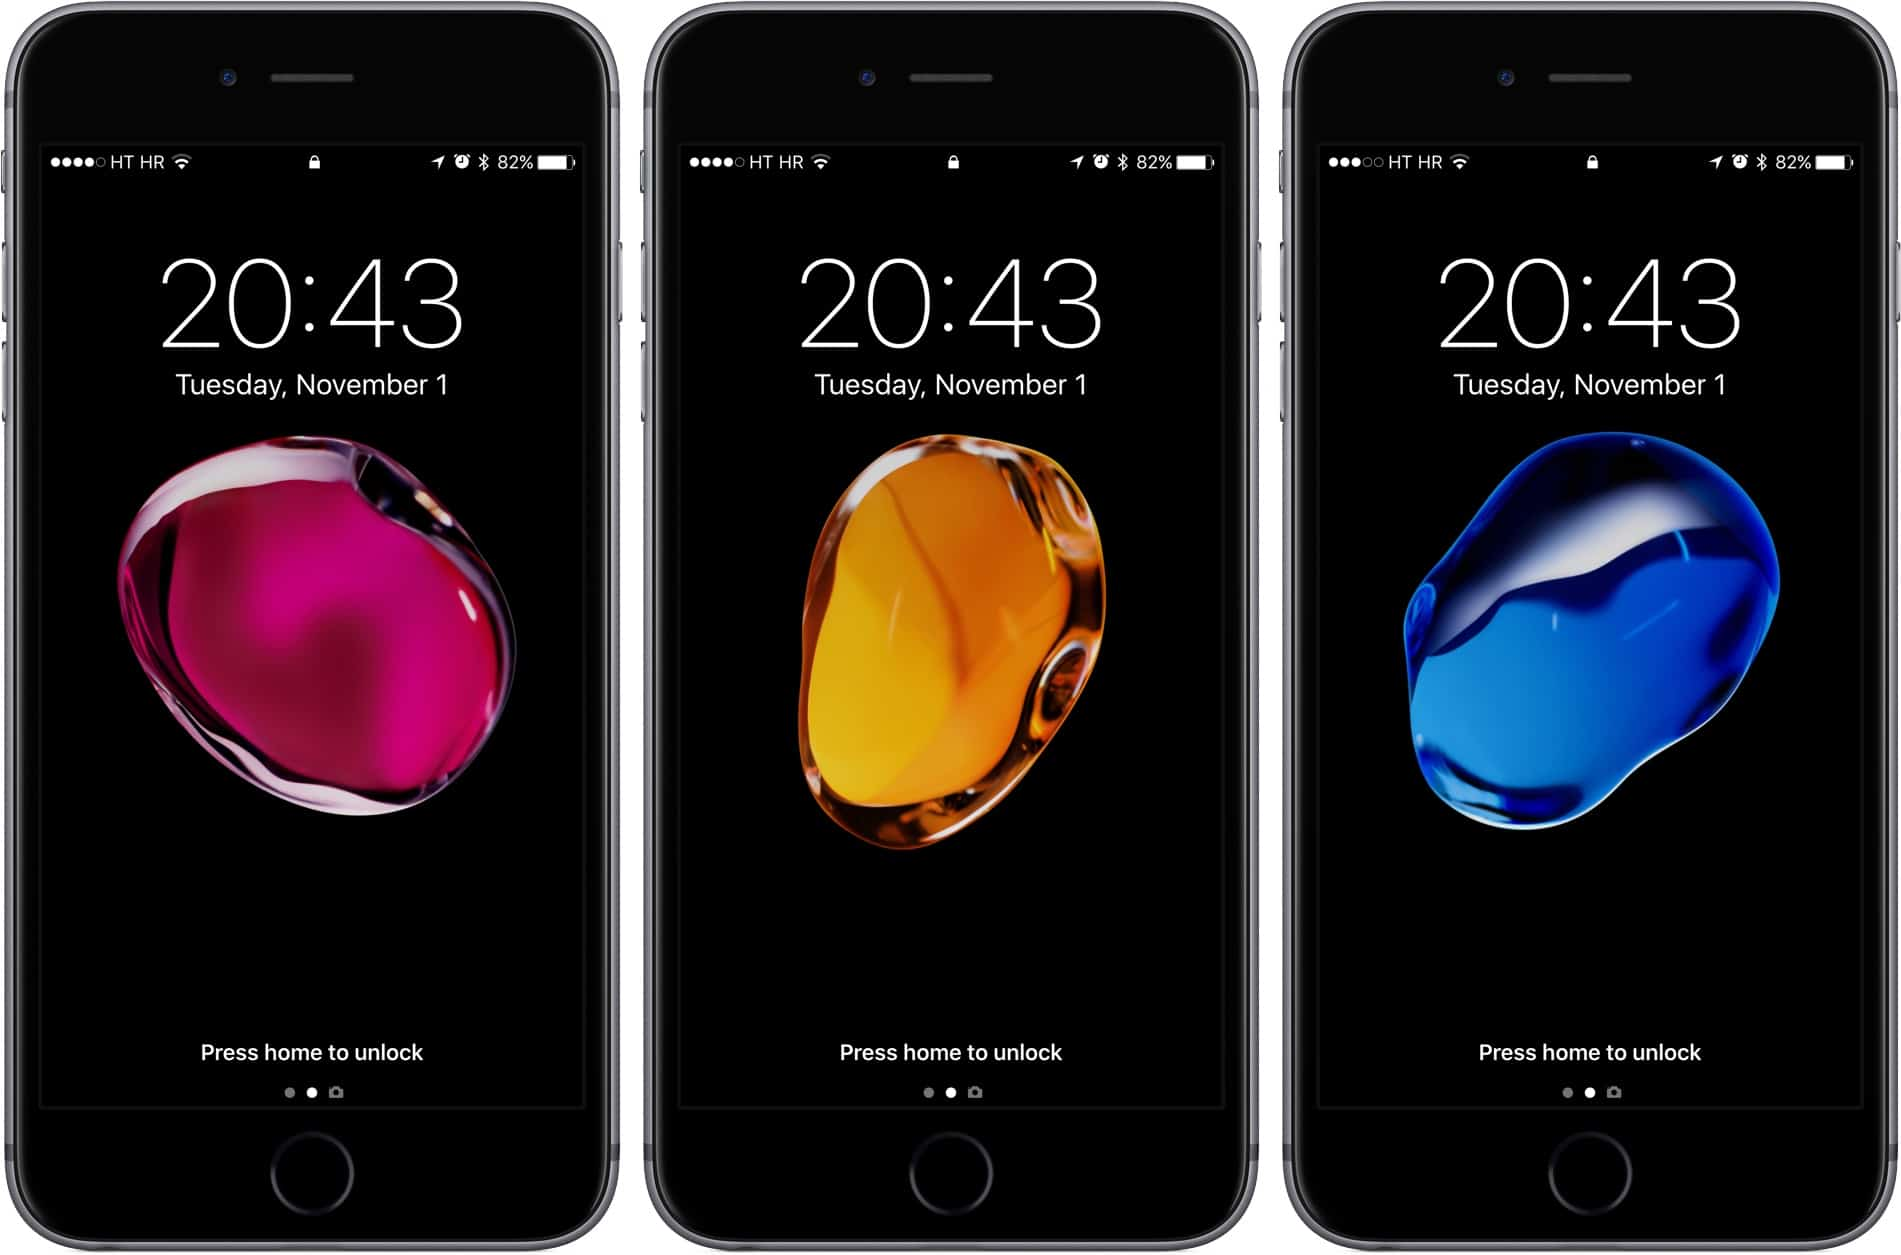 iOS 10 2 beta 1 Wallpapers iPhone screenshot 002